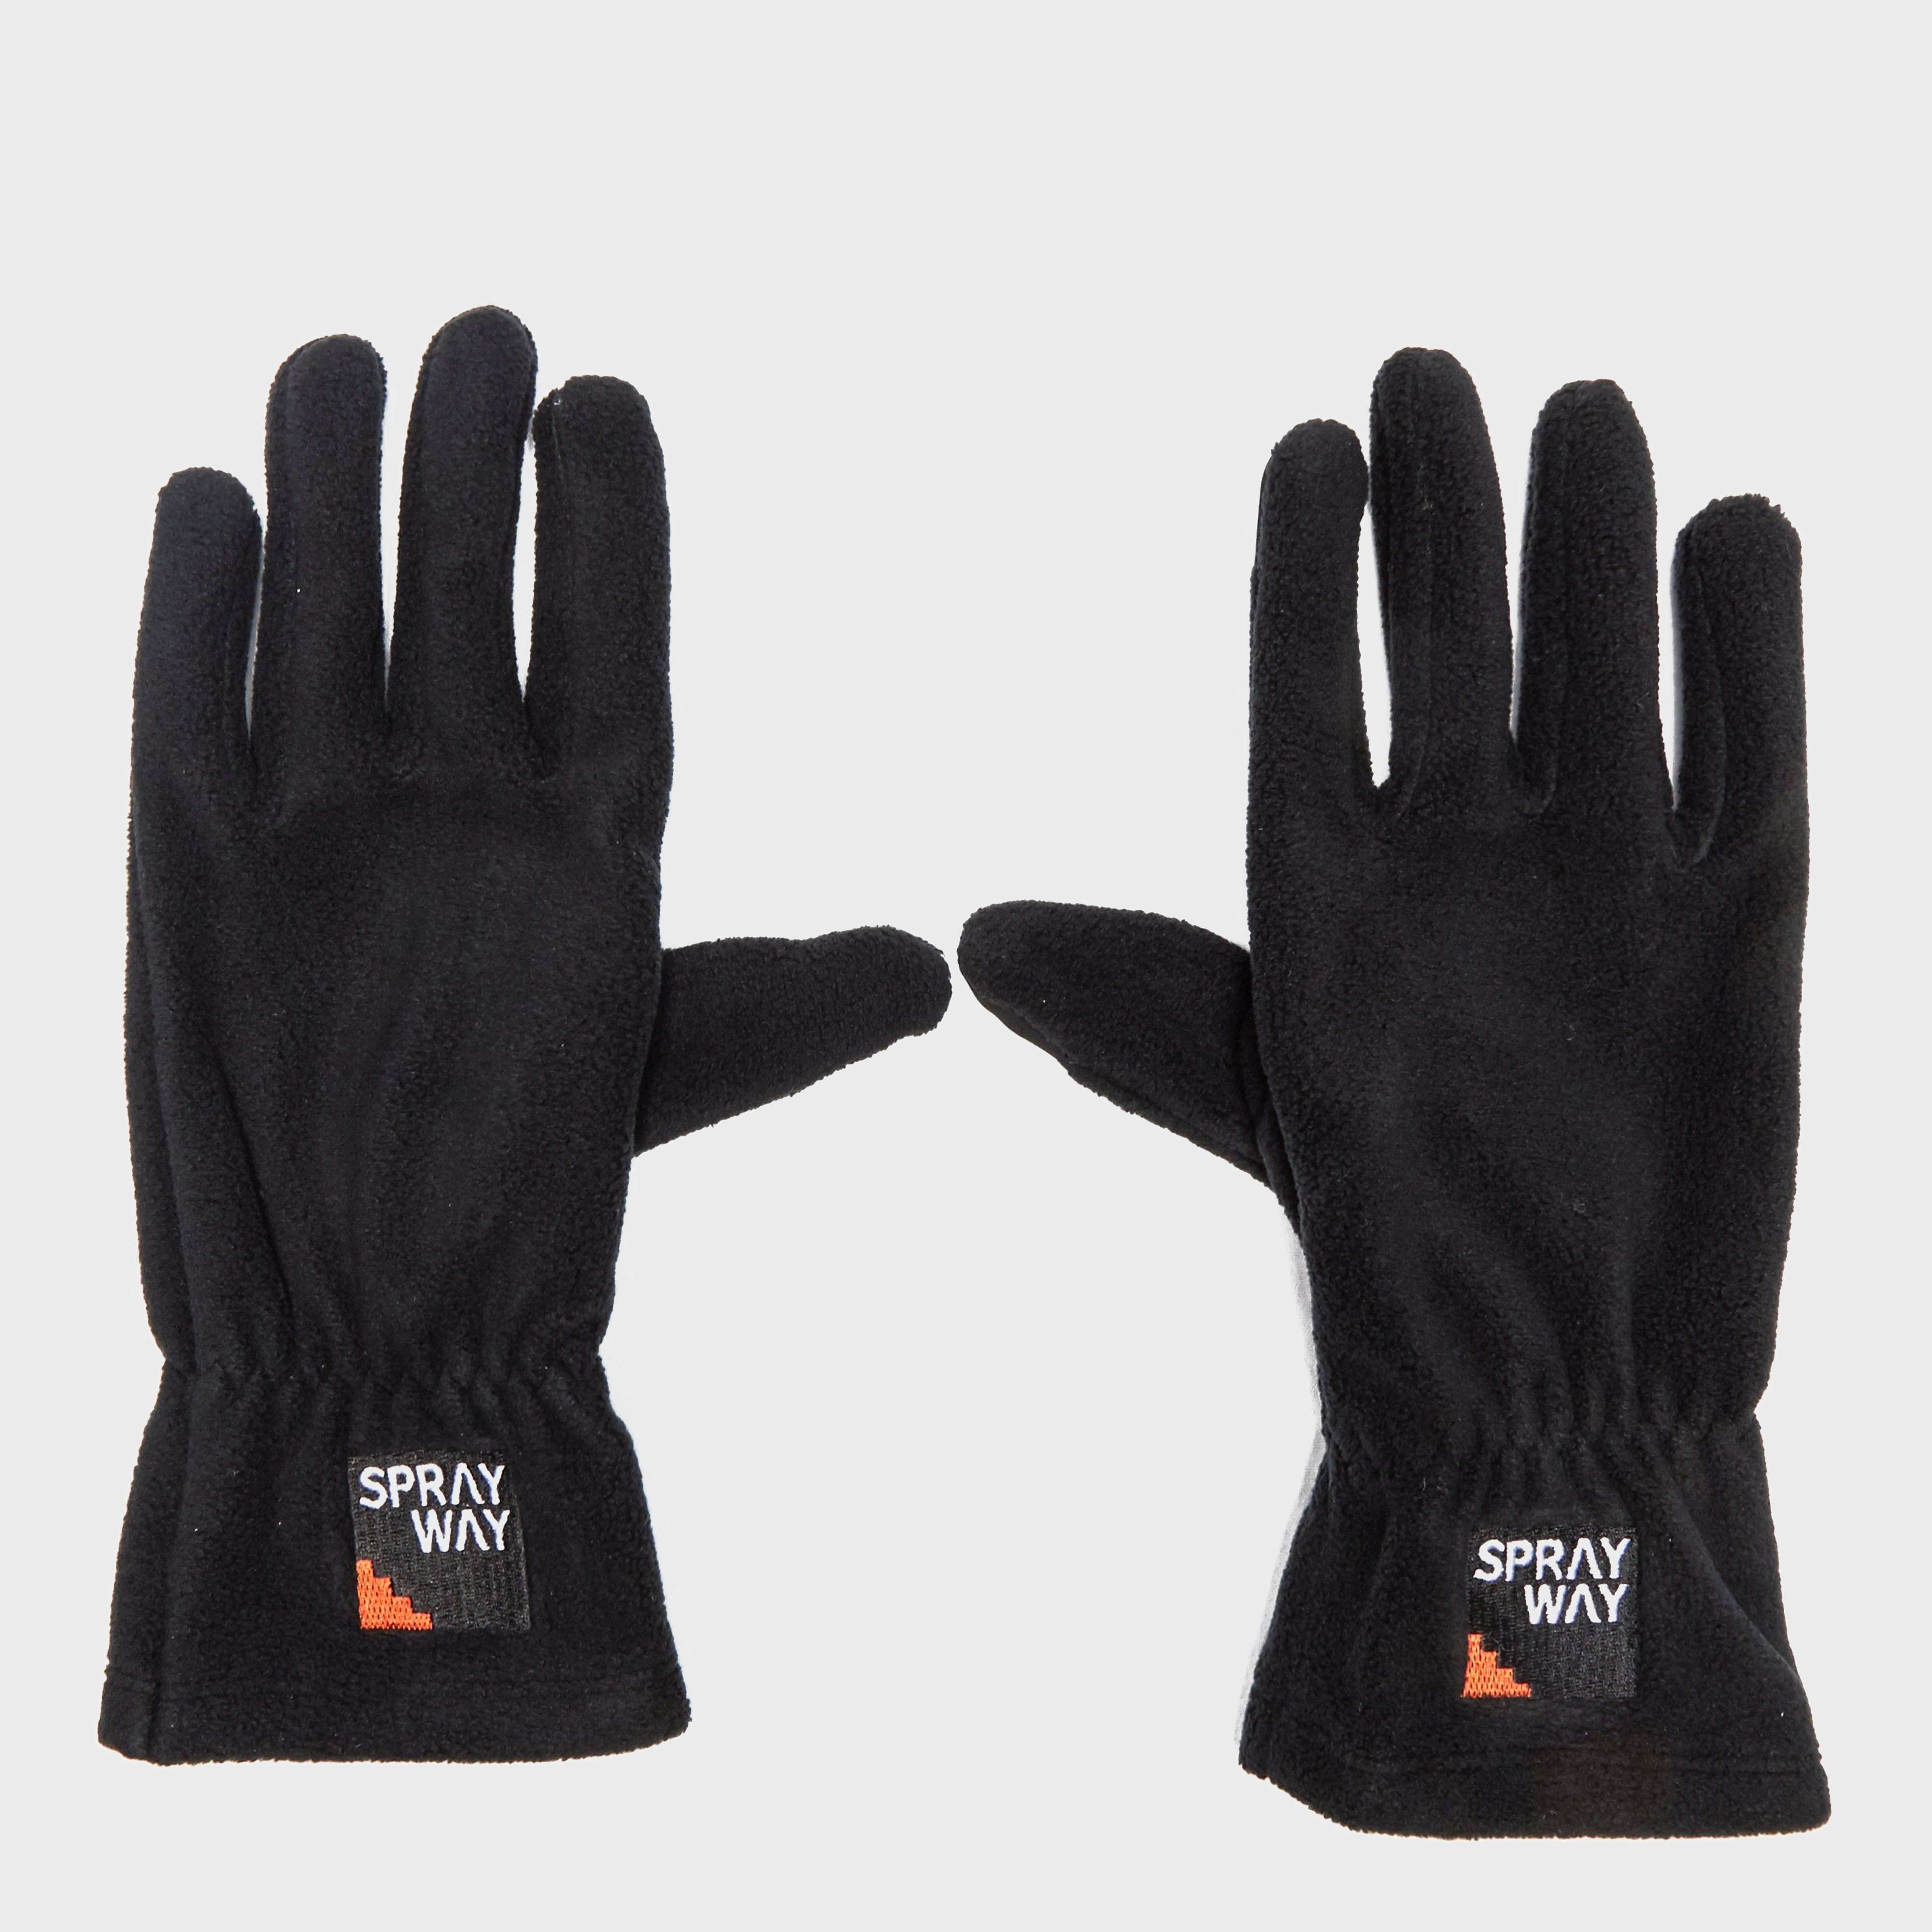 SPRAYWAY Women's Touchscreen Fleece Gloves